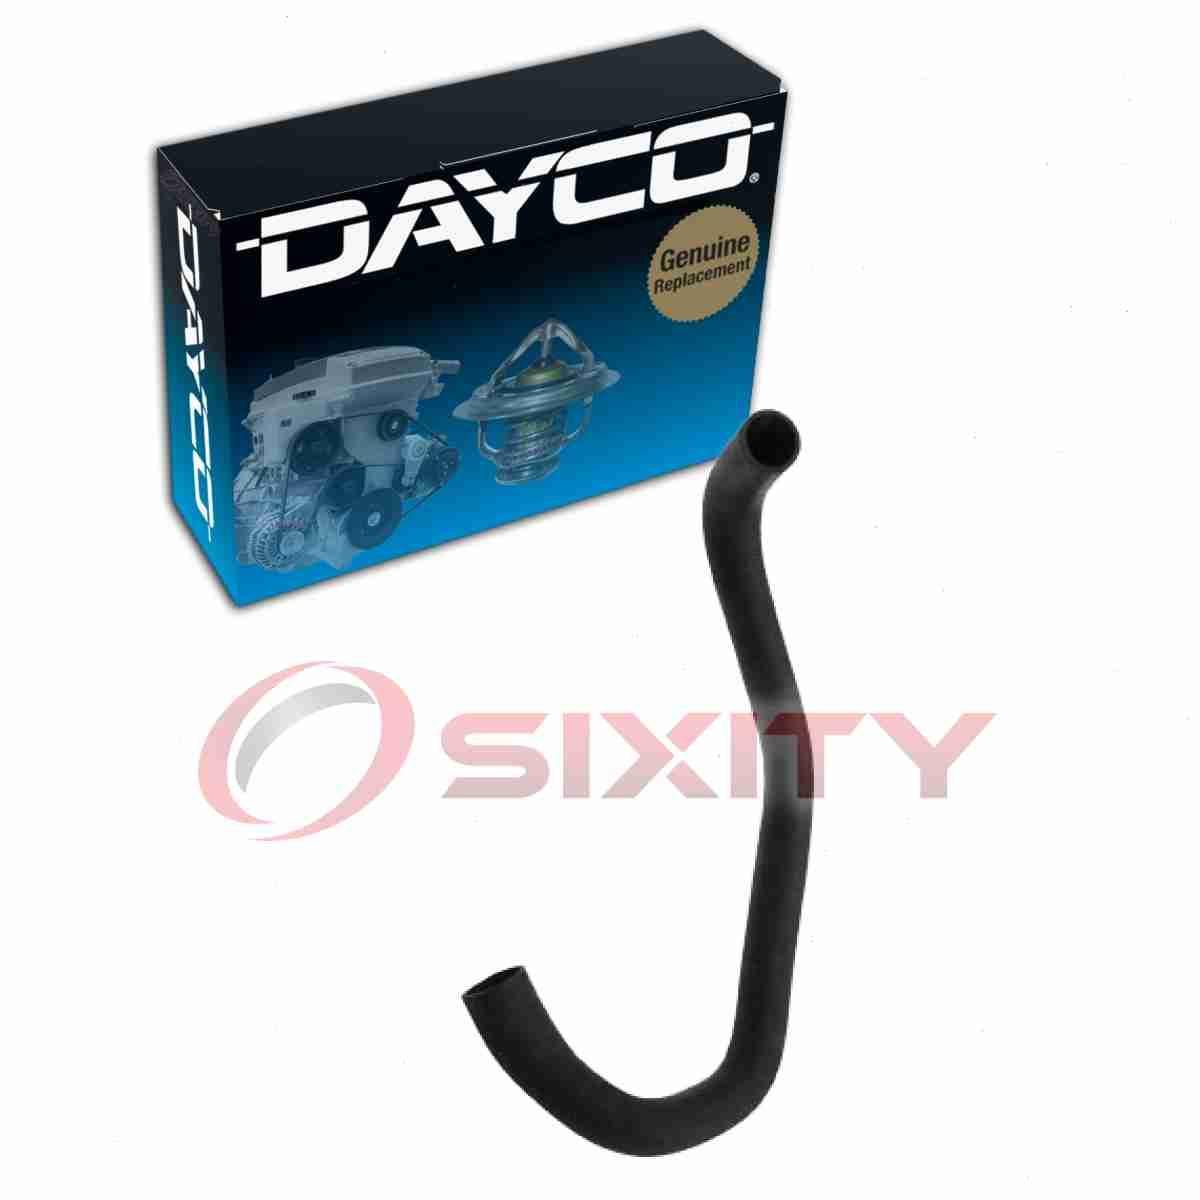 Engine uk Dayco Lower Radiator Hose for 2005-2016 Chrysler 300 5.7L V8